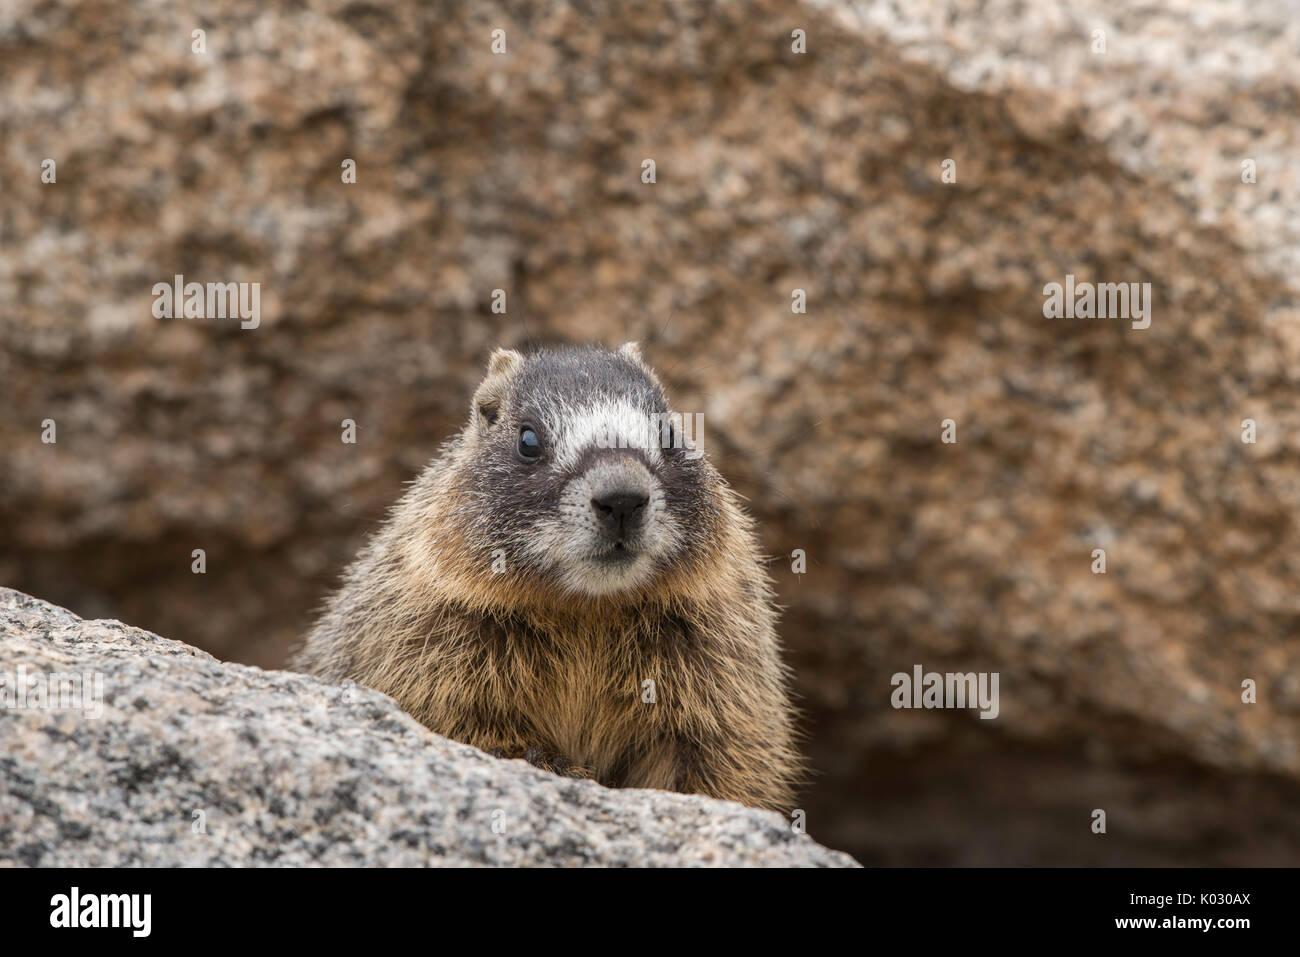 Baby yellow-bellied marmot - Stock Image